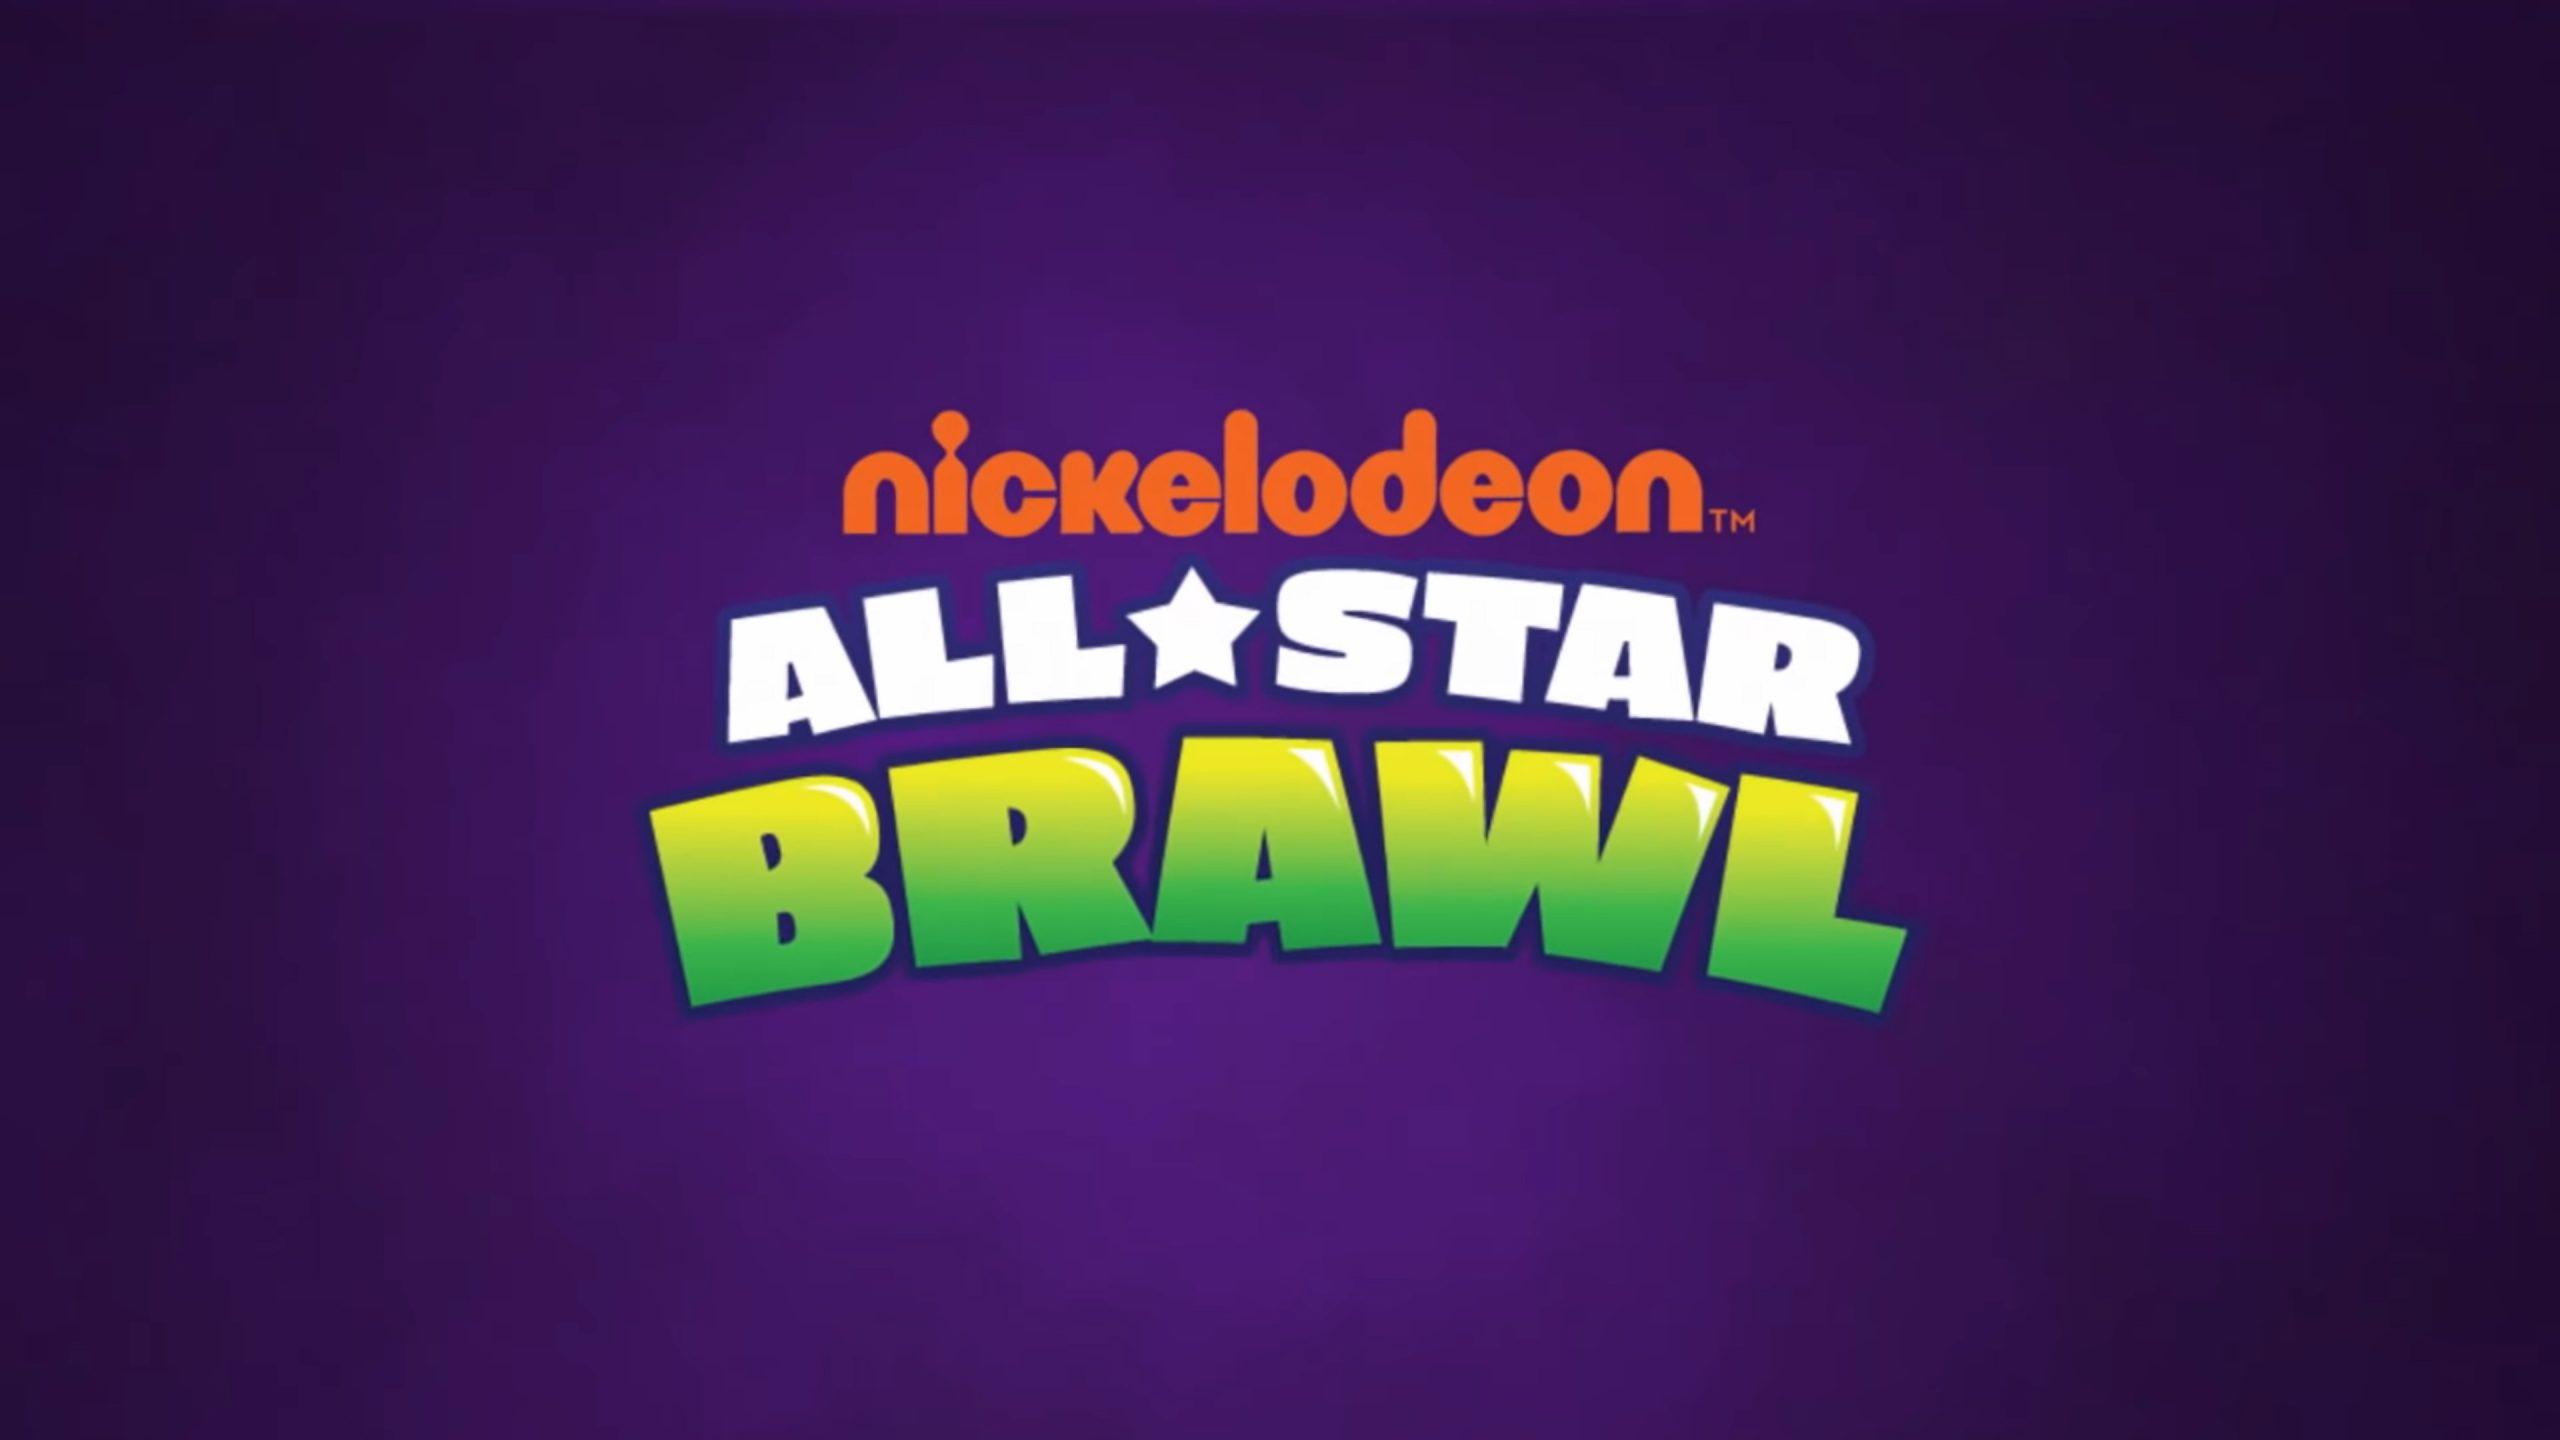 nickelodeon all star brawl logo wallpaper 75905